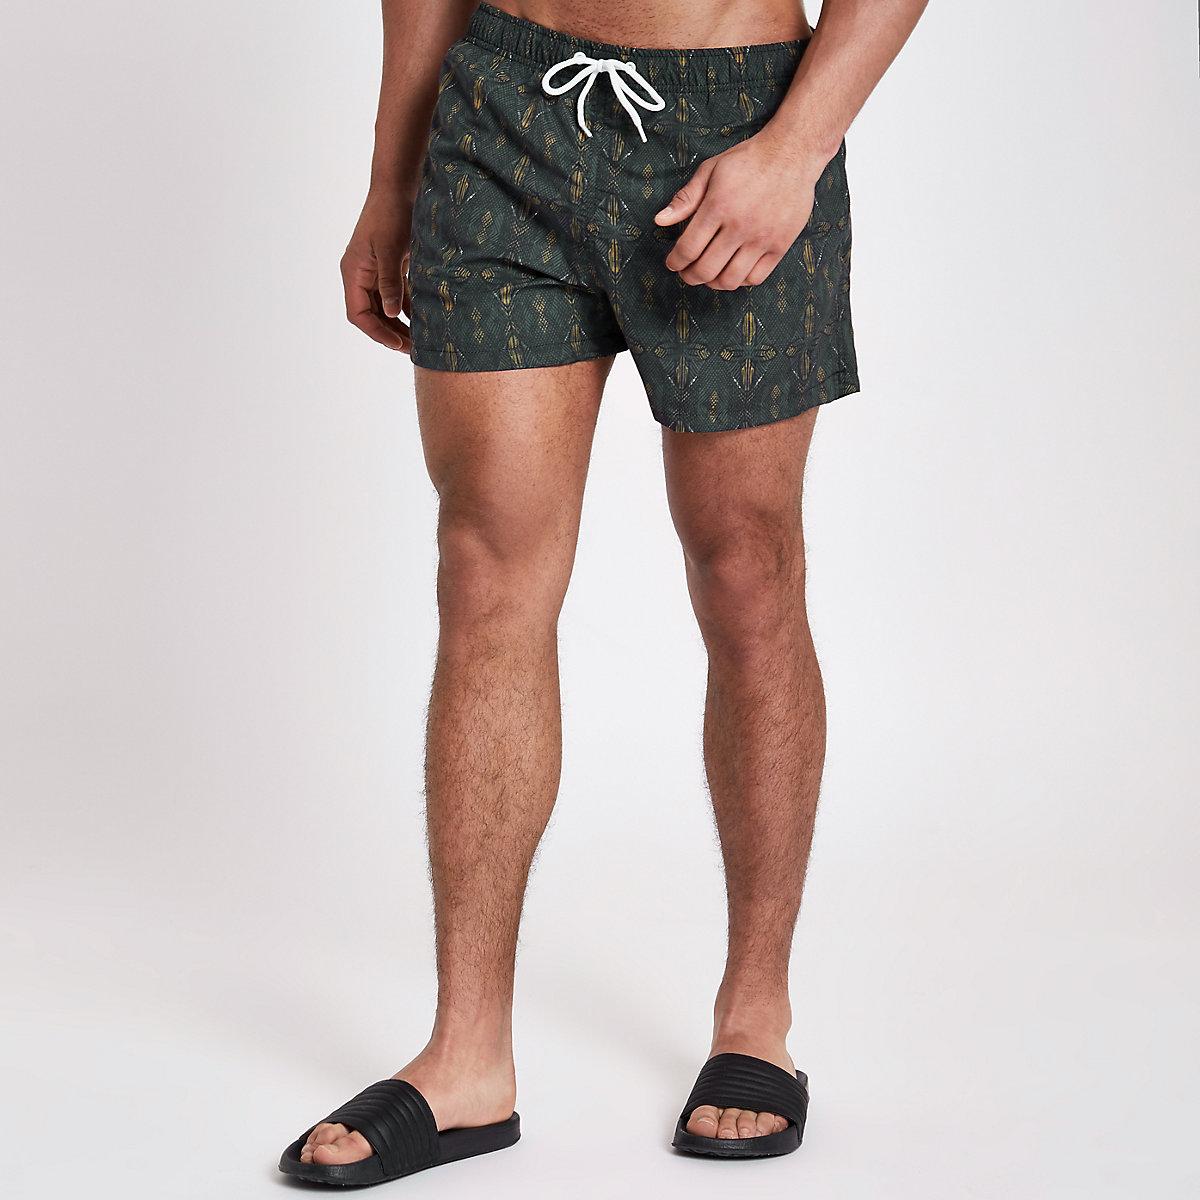 Green aztec print short swim trunks